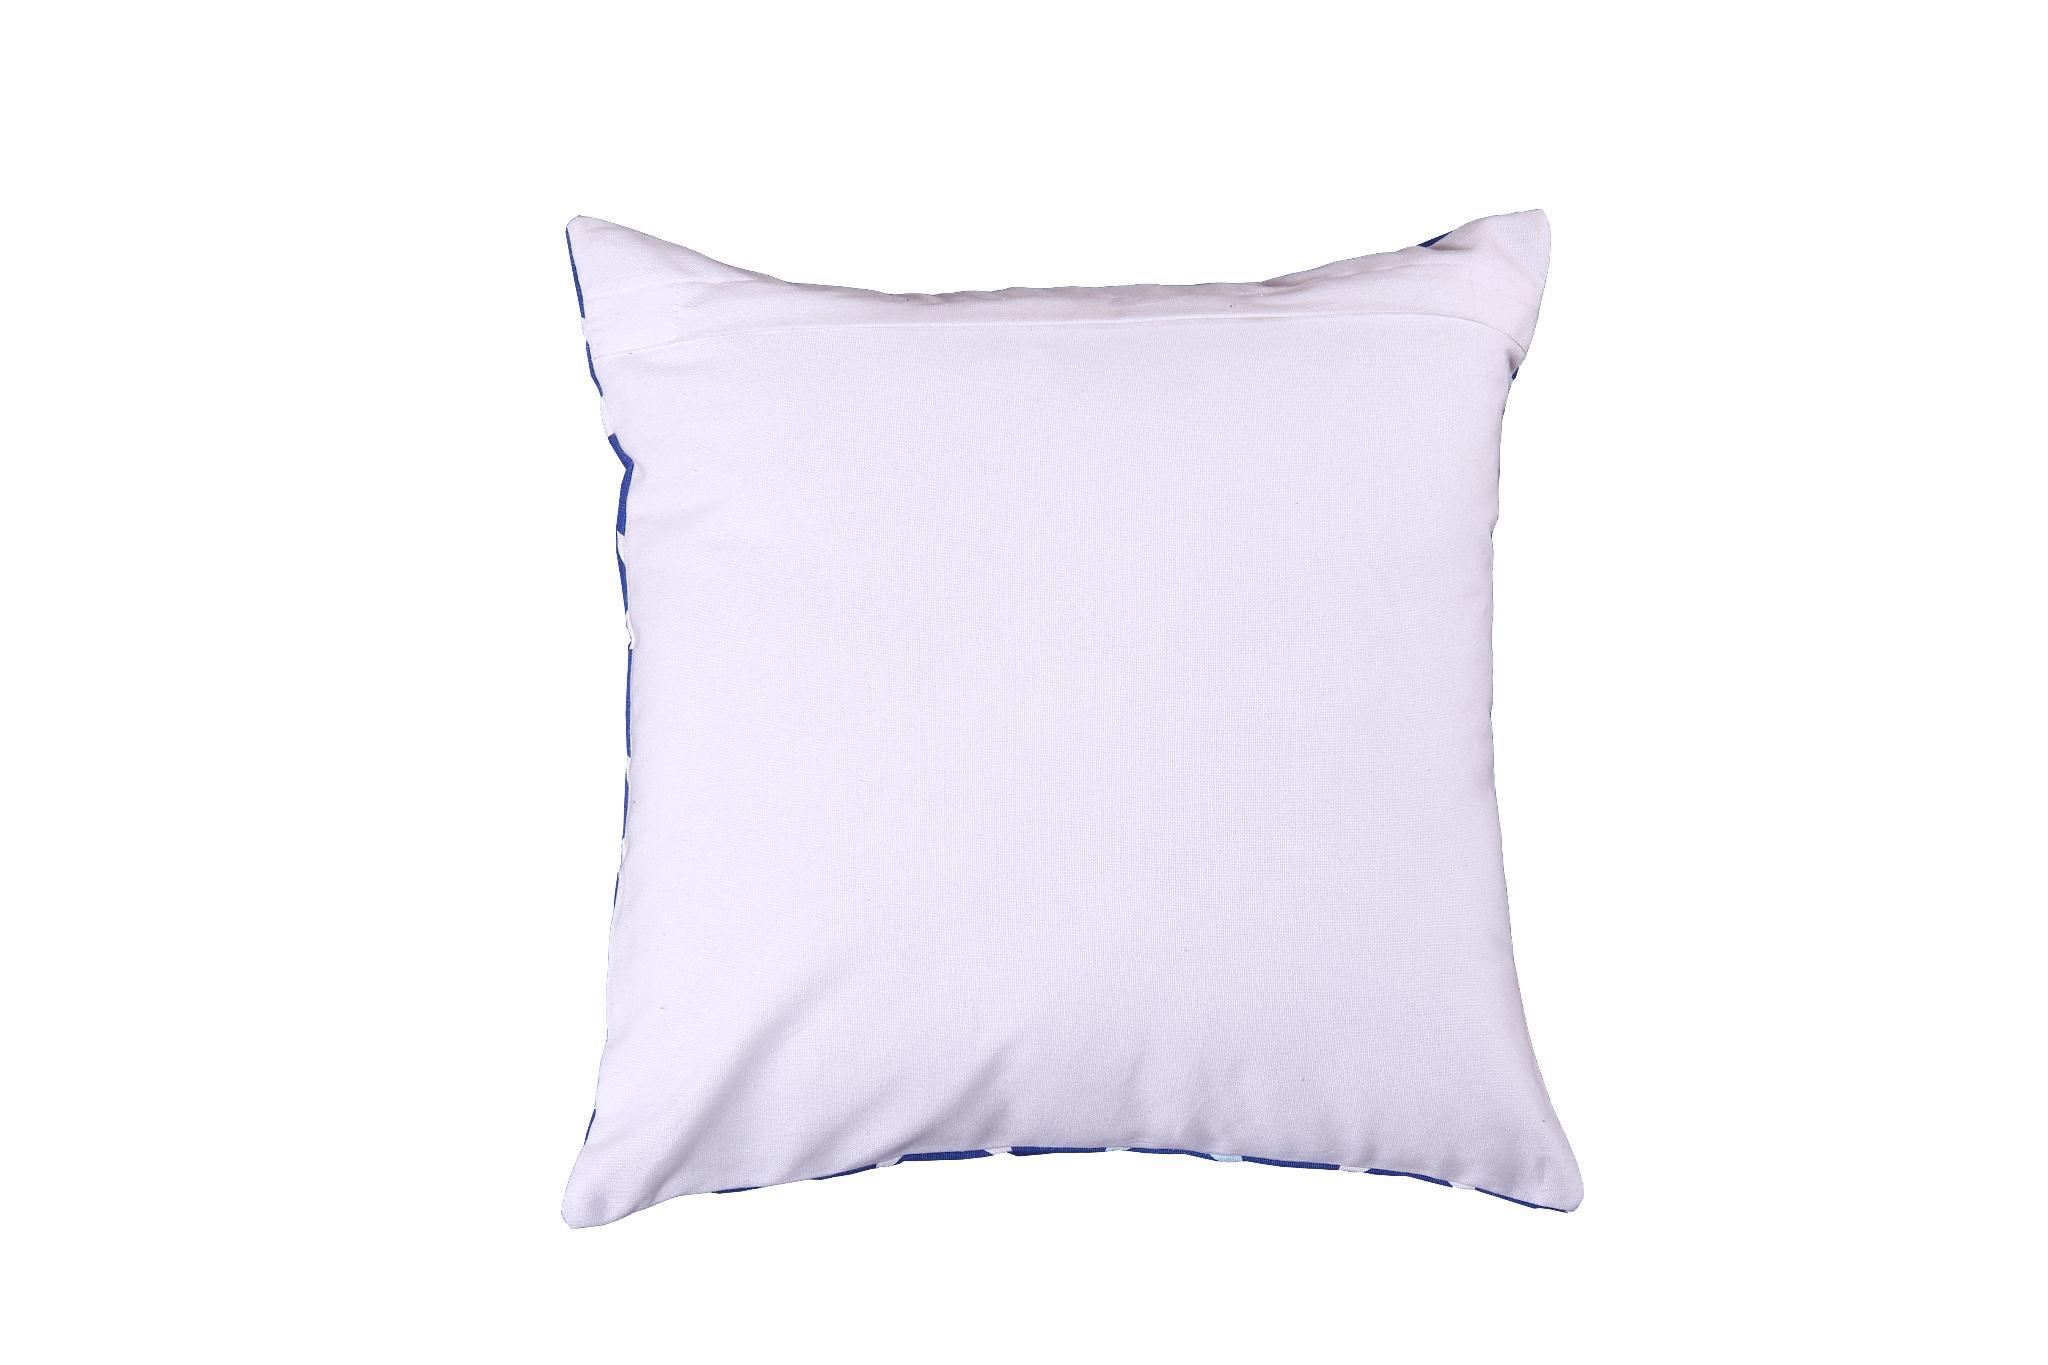 aratextil hogar coussin bleu toiles rouges blanches et bleu ciel. Black Bedroom Furniture Sets. Home Design Ideas